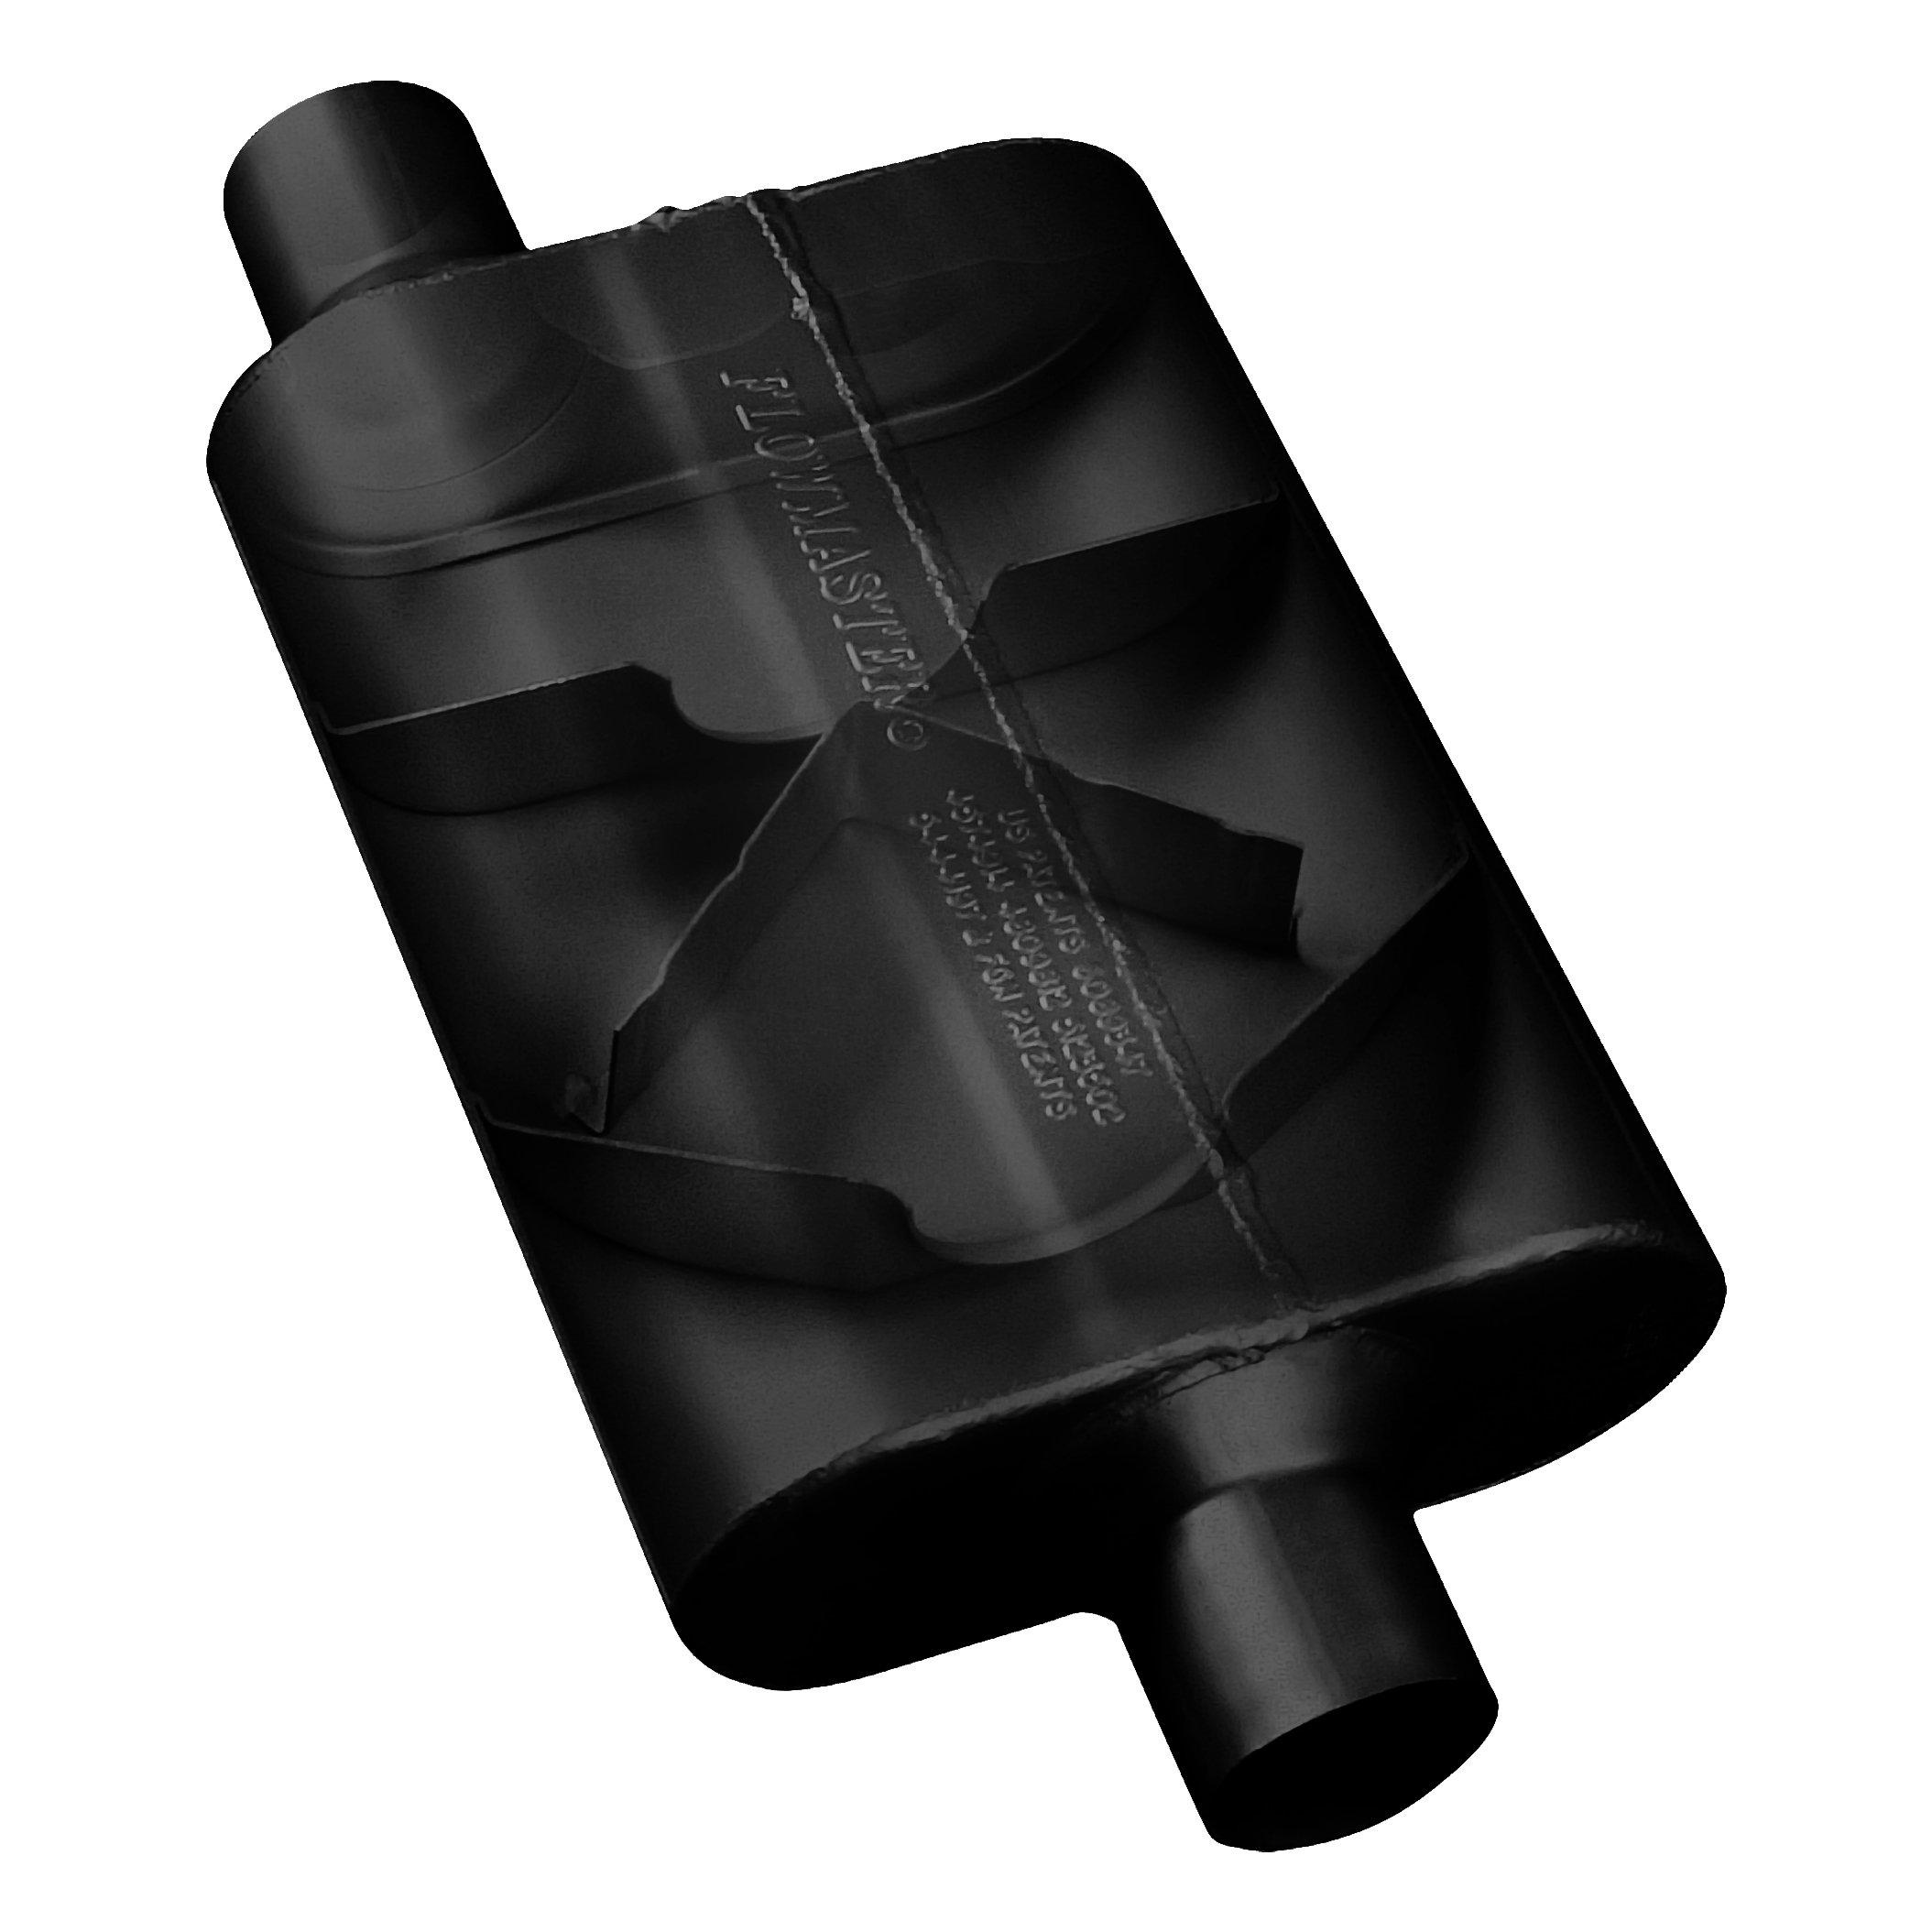 Flowmaster 8042543 40 Series Muffler